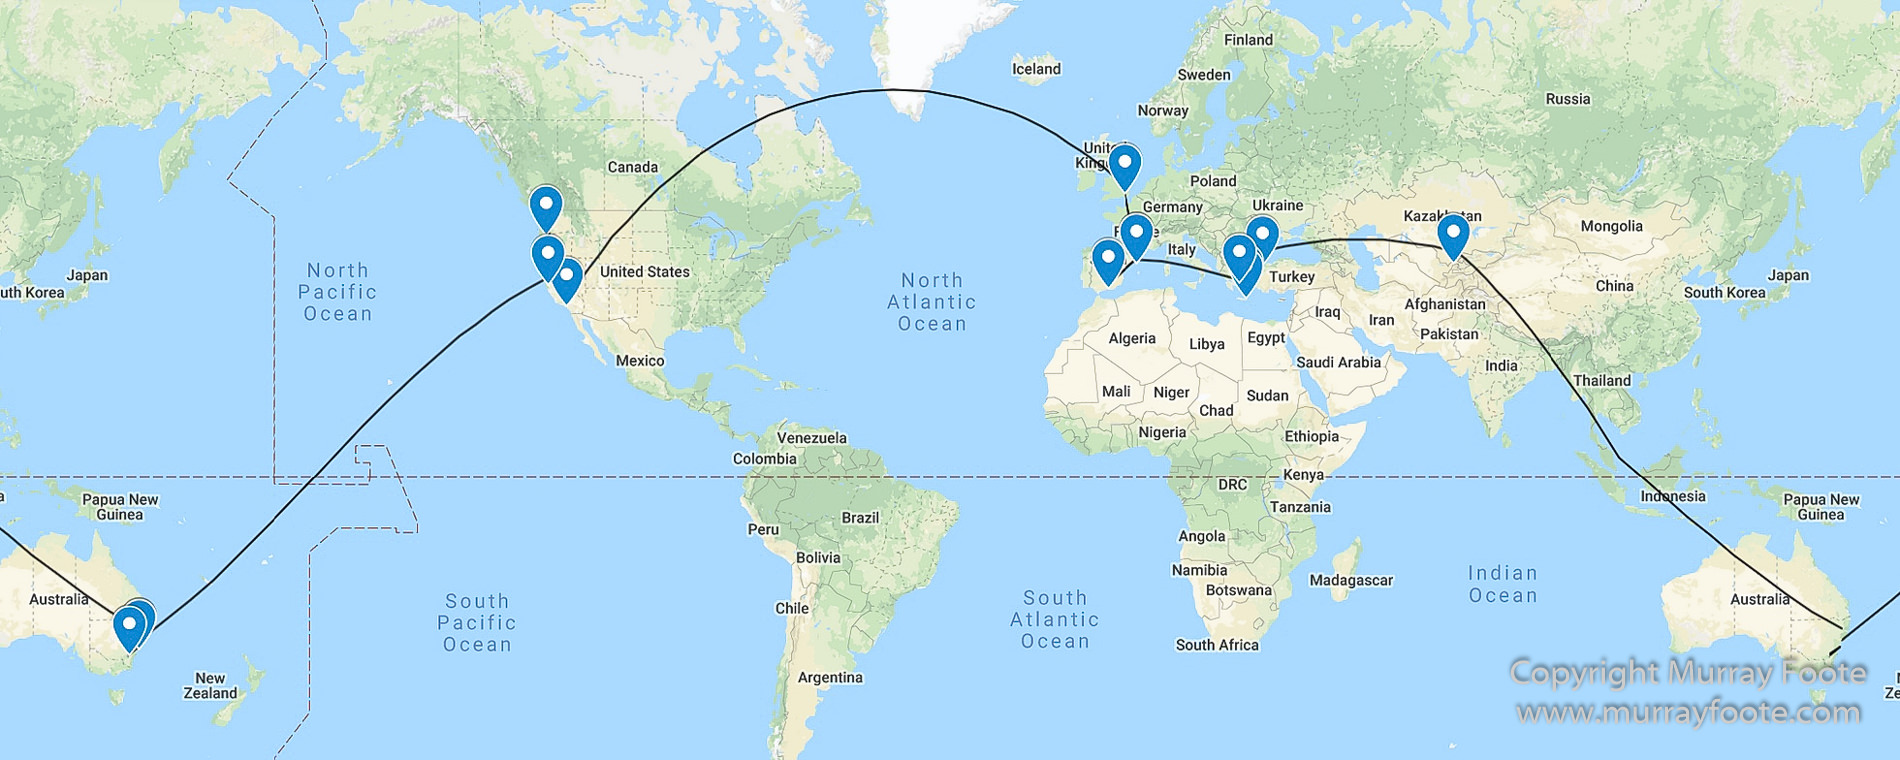 Uzbekistan Crete Spain And Oregon Itinerary Murray Foote